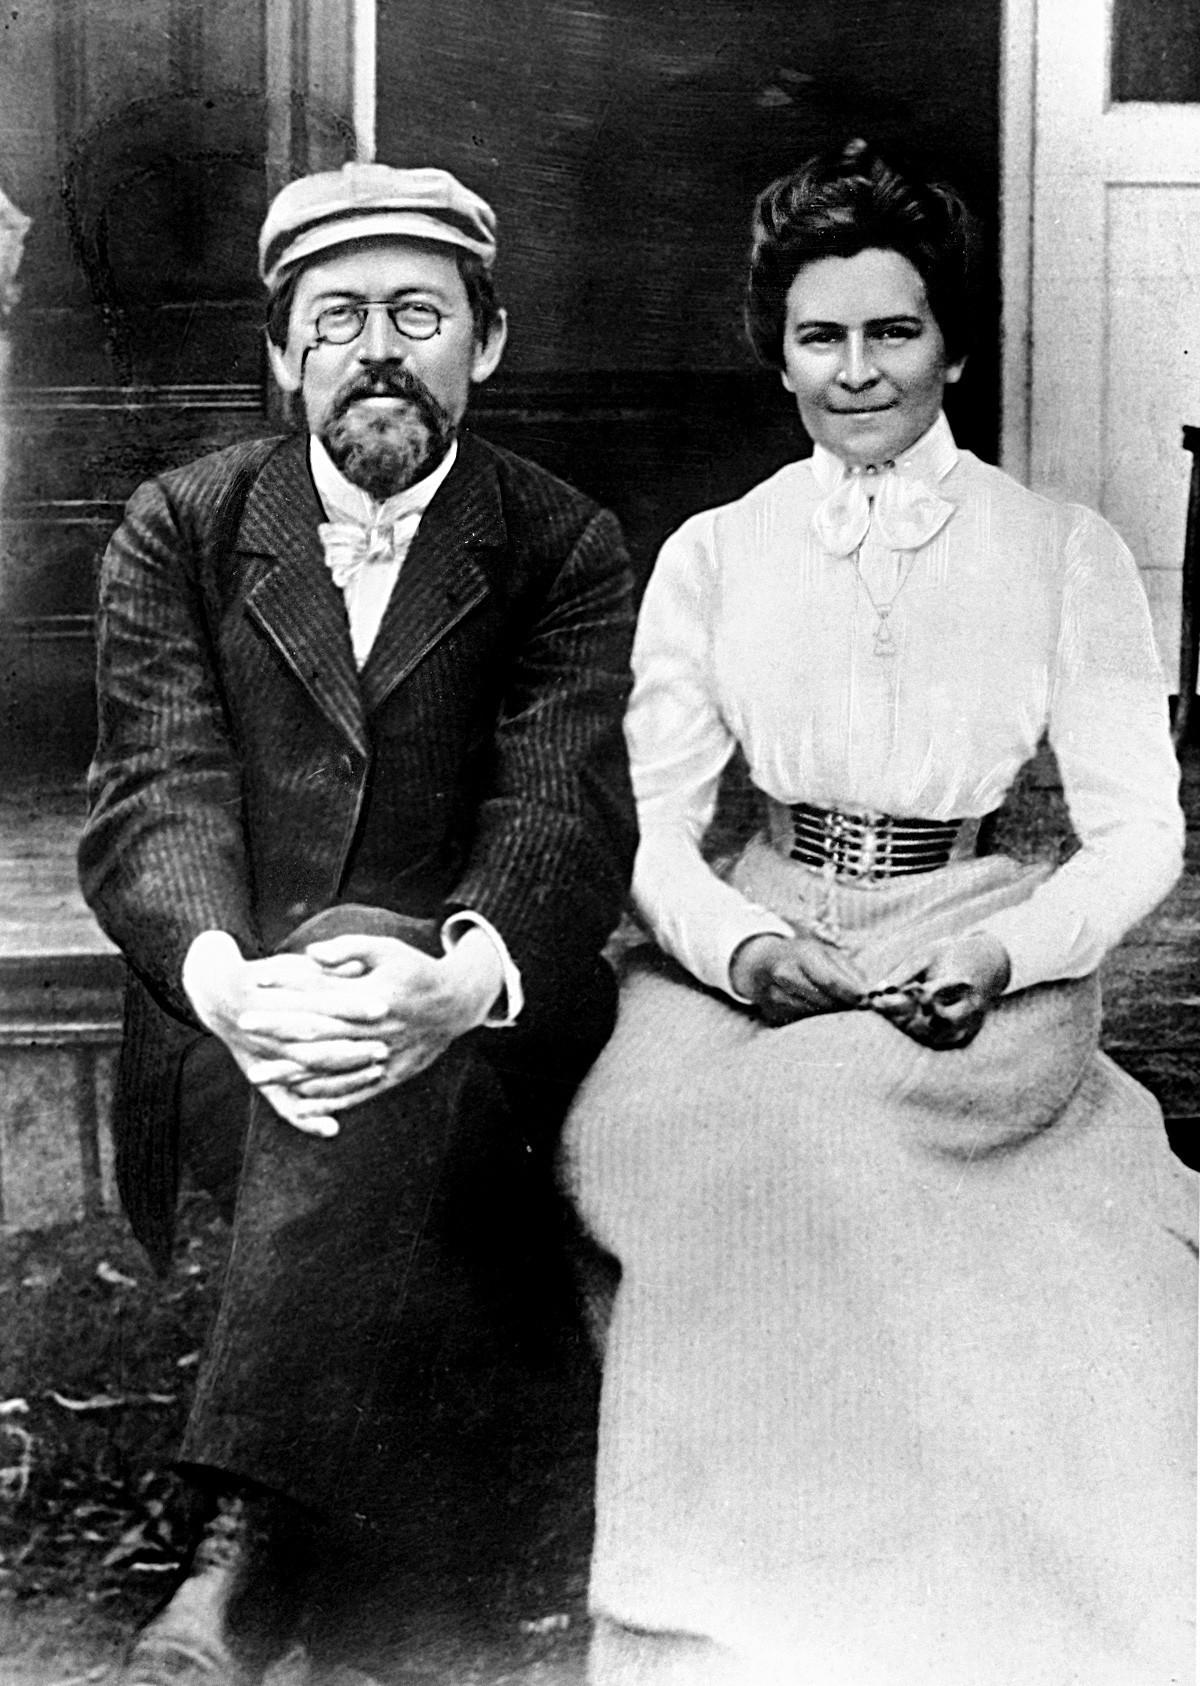 Penulis Rusia, Anton Chekhov dan istrinya, aktris Olga Knipper-Chekhova